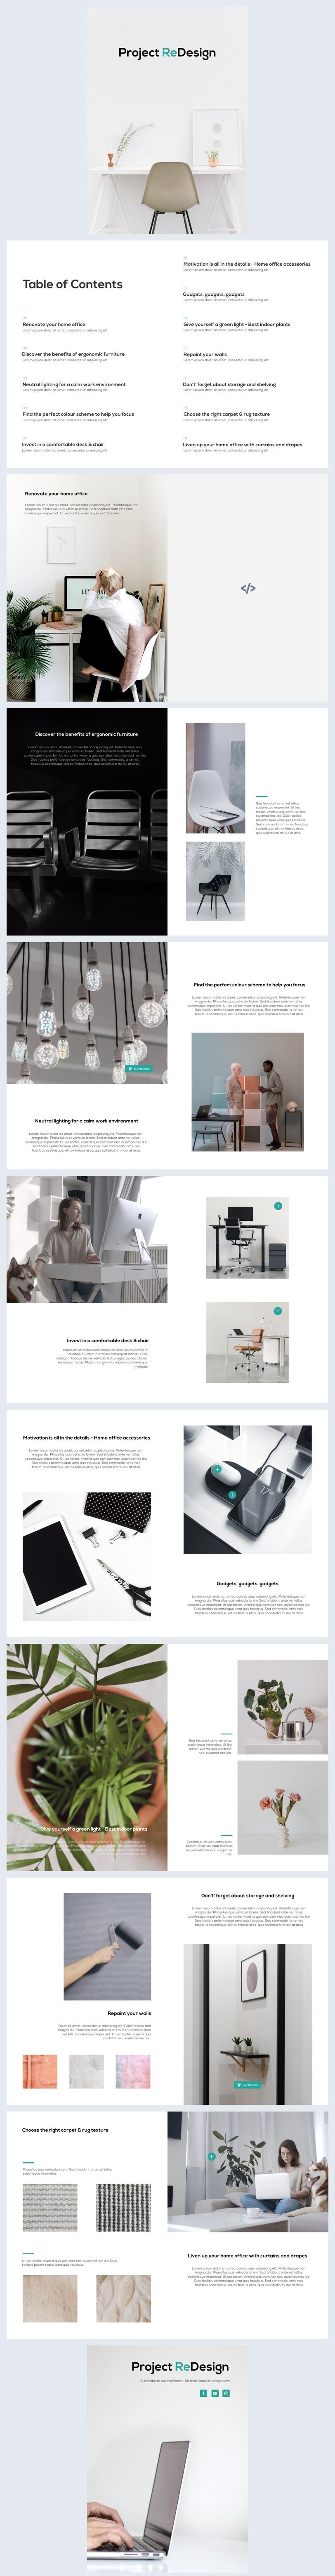 Interactive Design Project Magazine Sample